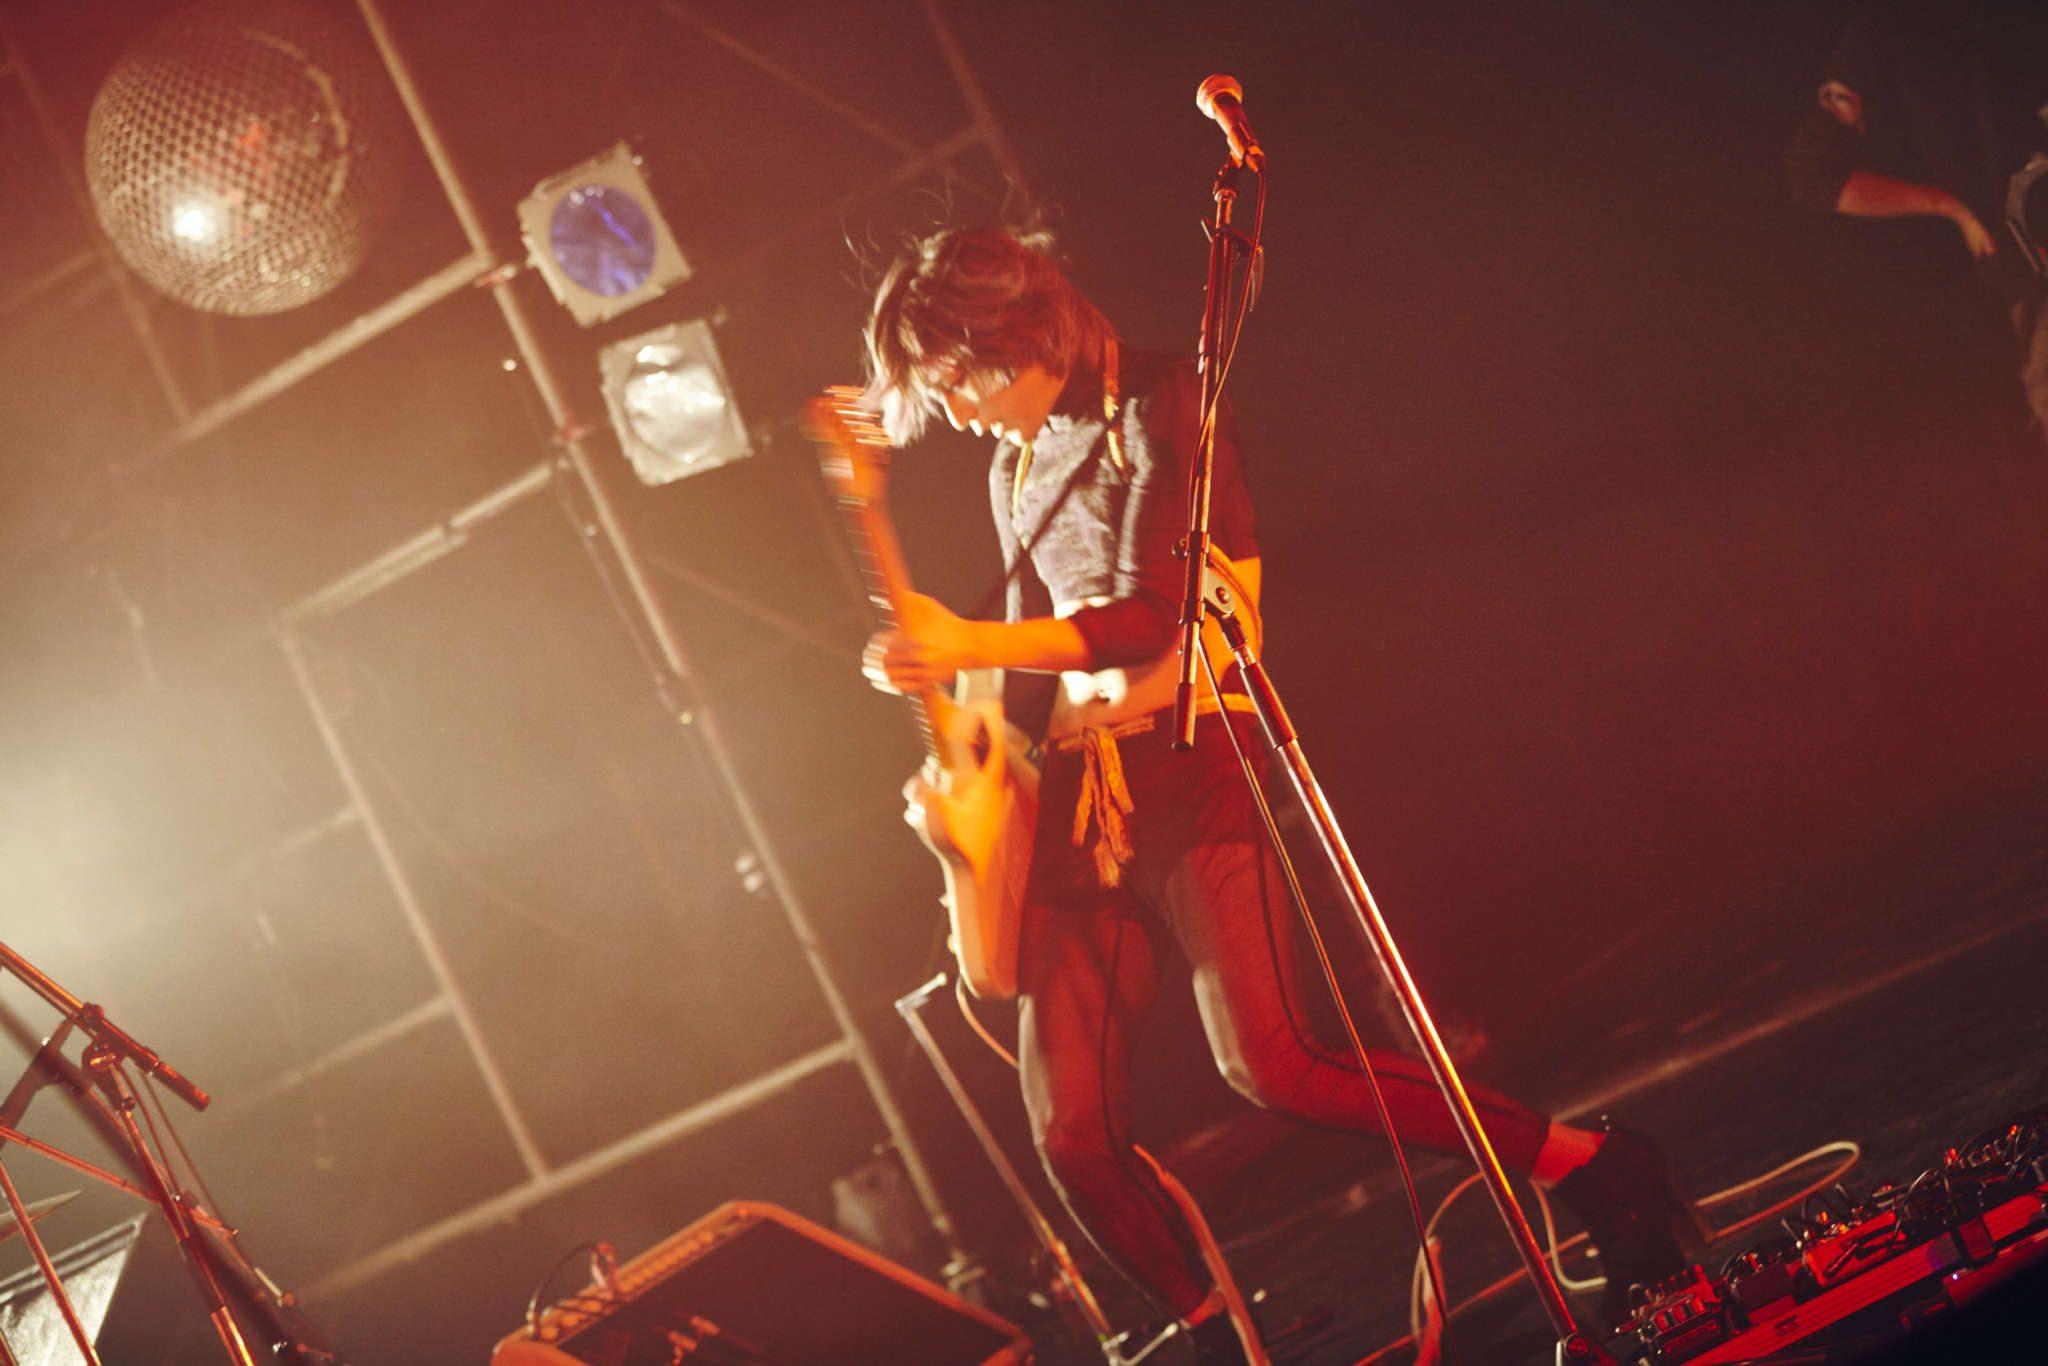 Seul homme du groupe, Hibari à la guitare - Photographe : Nakano Shuuya (中野修也)